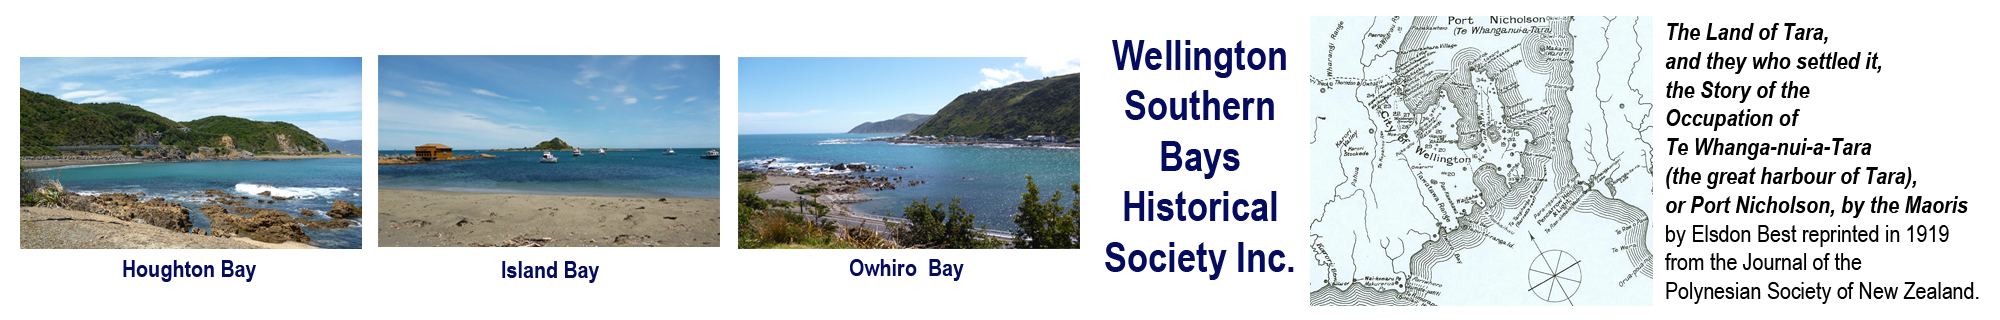 Southern Bays Historical Society